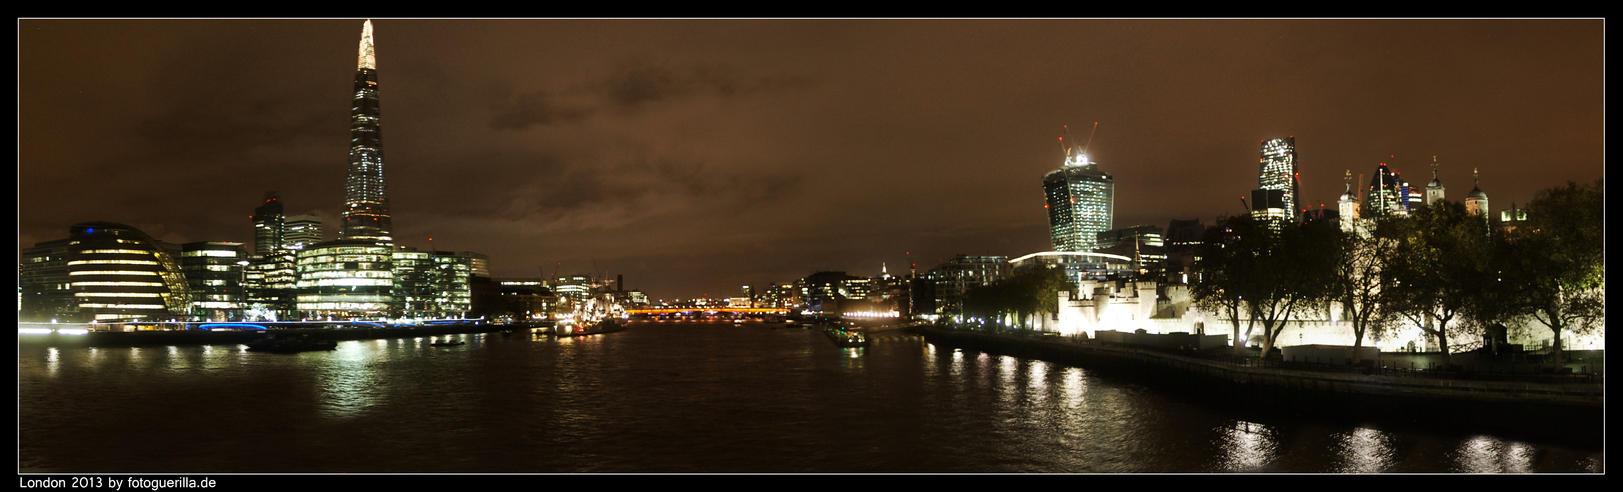 Panorma London by fotoguerilla